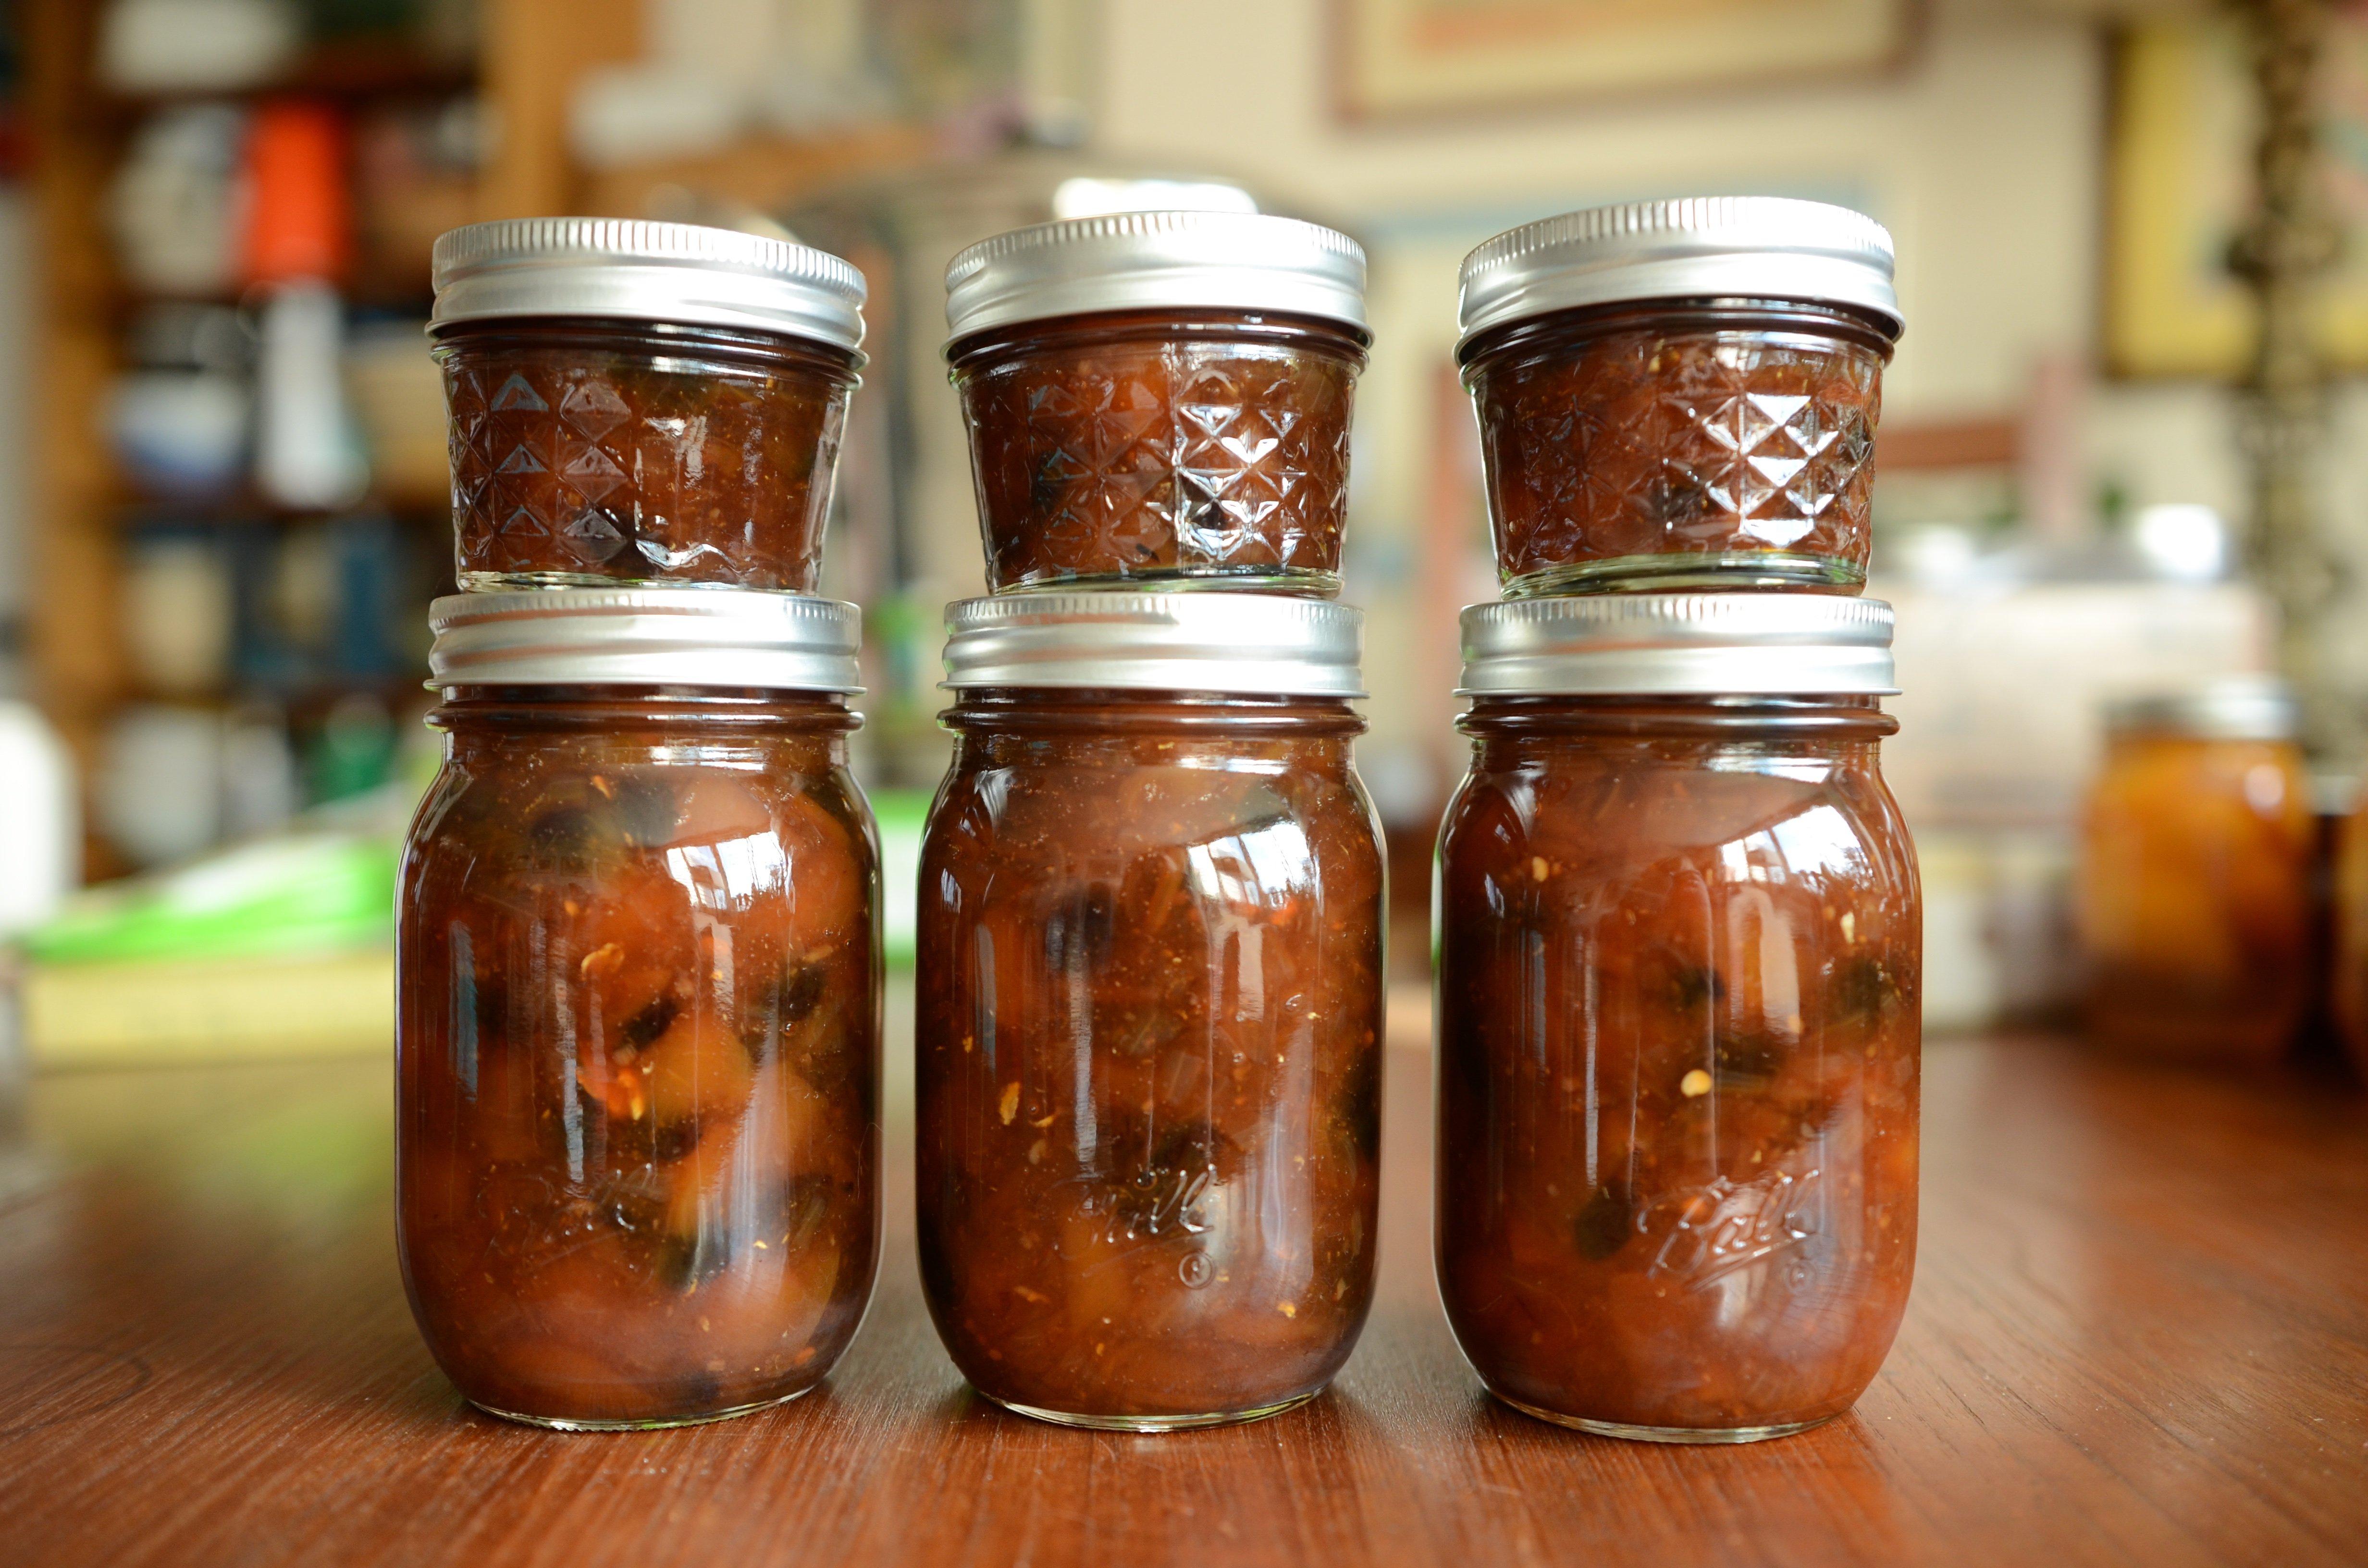 Six jars of Indiana Peach Chutney